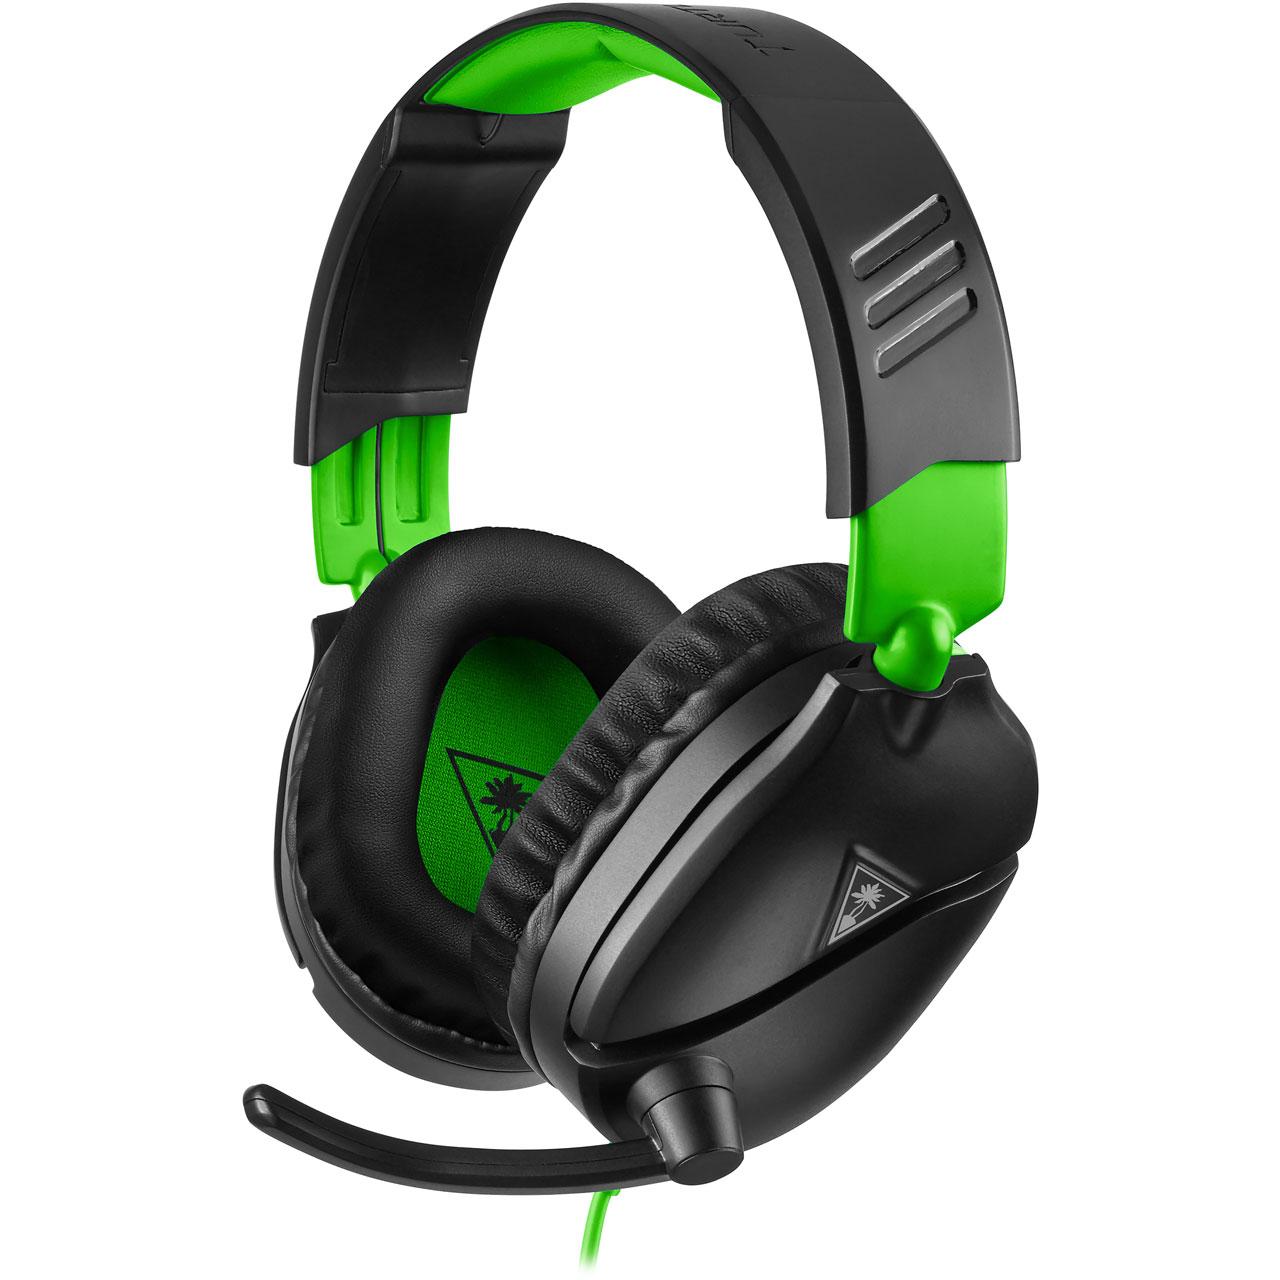 Turtle Beach Recon 70X Gaming Headset - Black / Green